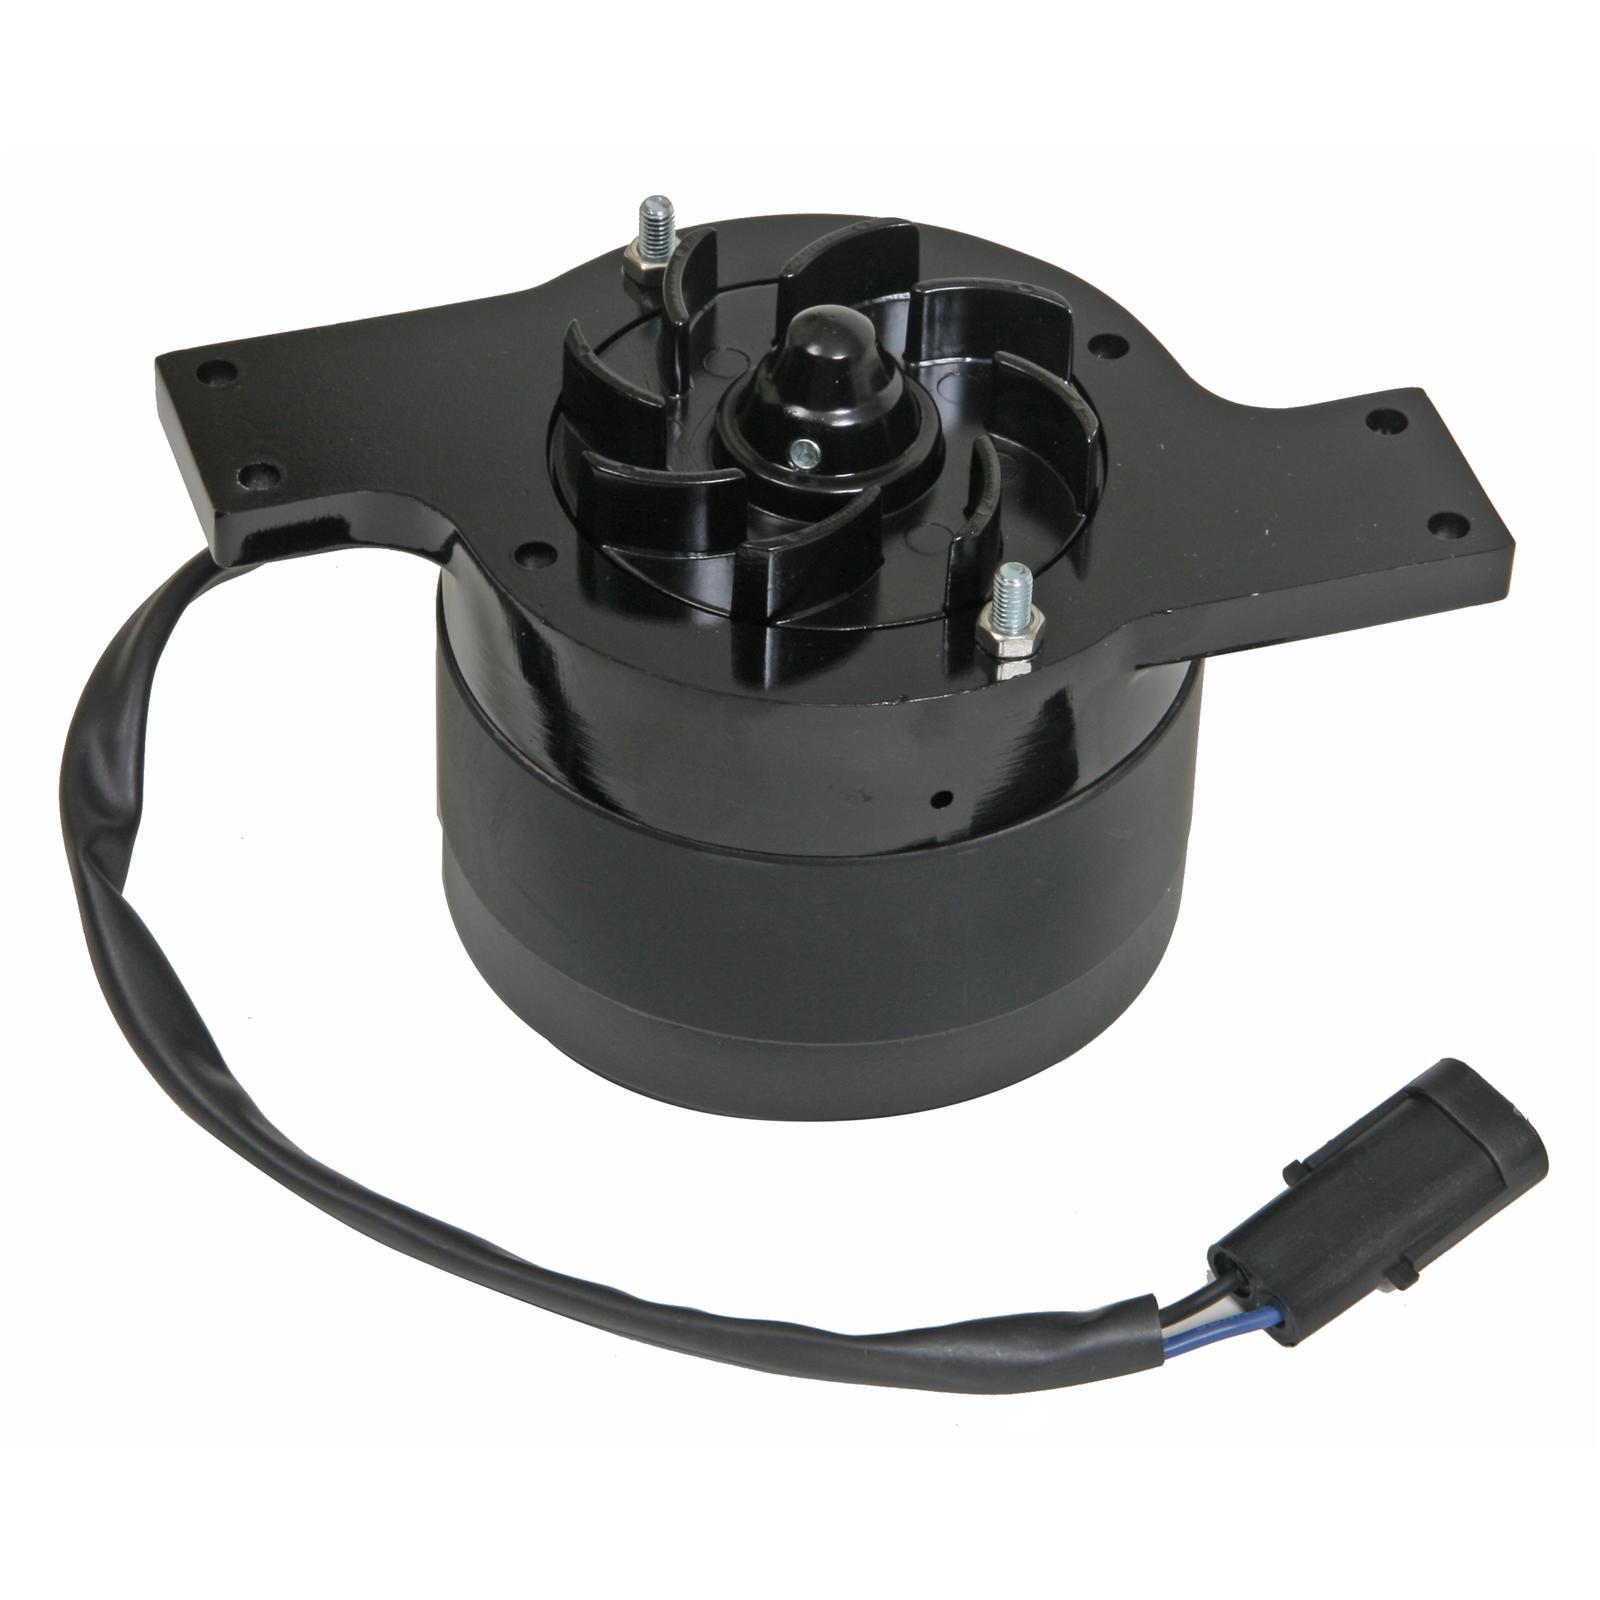 Proform electric water pump replacement motors 66226bk for Water pump motor parts